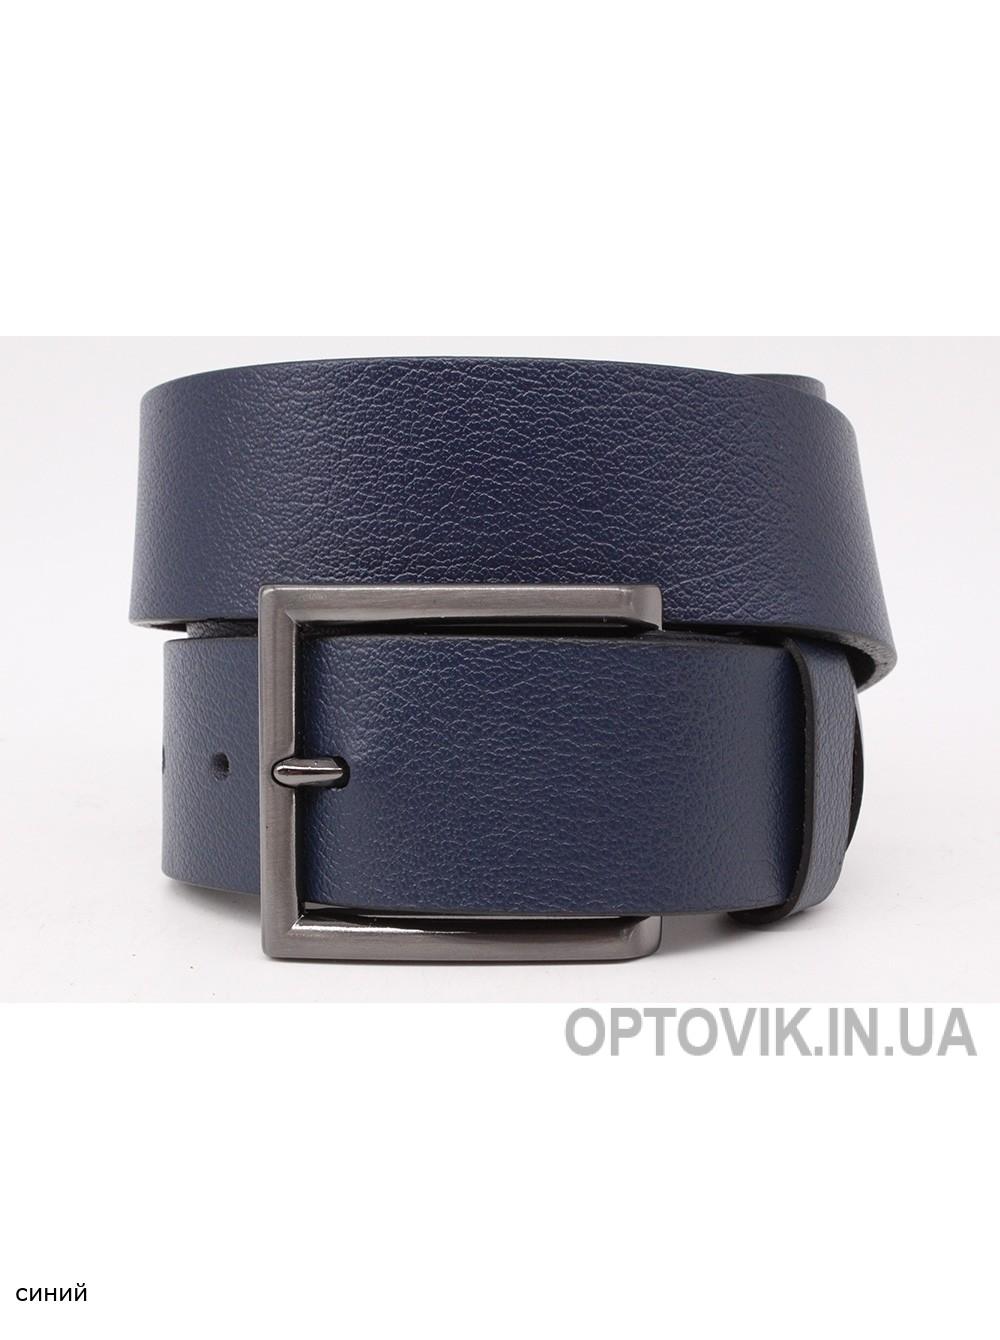 Ремень кожа 40 Real Leather - rl161874